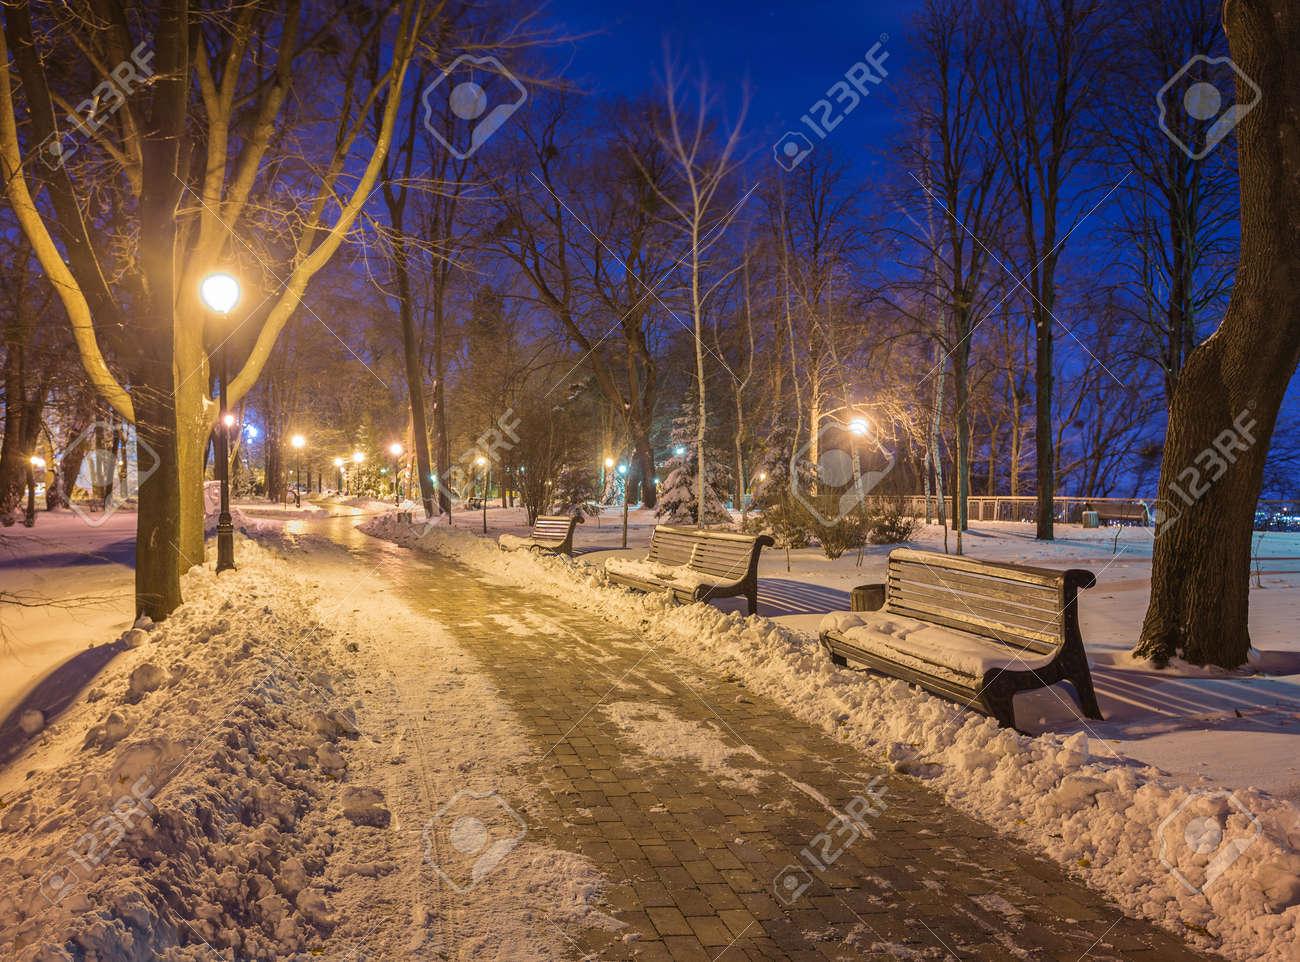 bench lighting. Under Bench Lighting. Stock Photo - Winter Night Landscape- Trees And Shining Lighting E